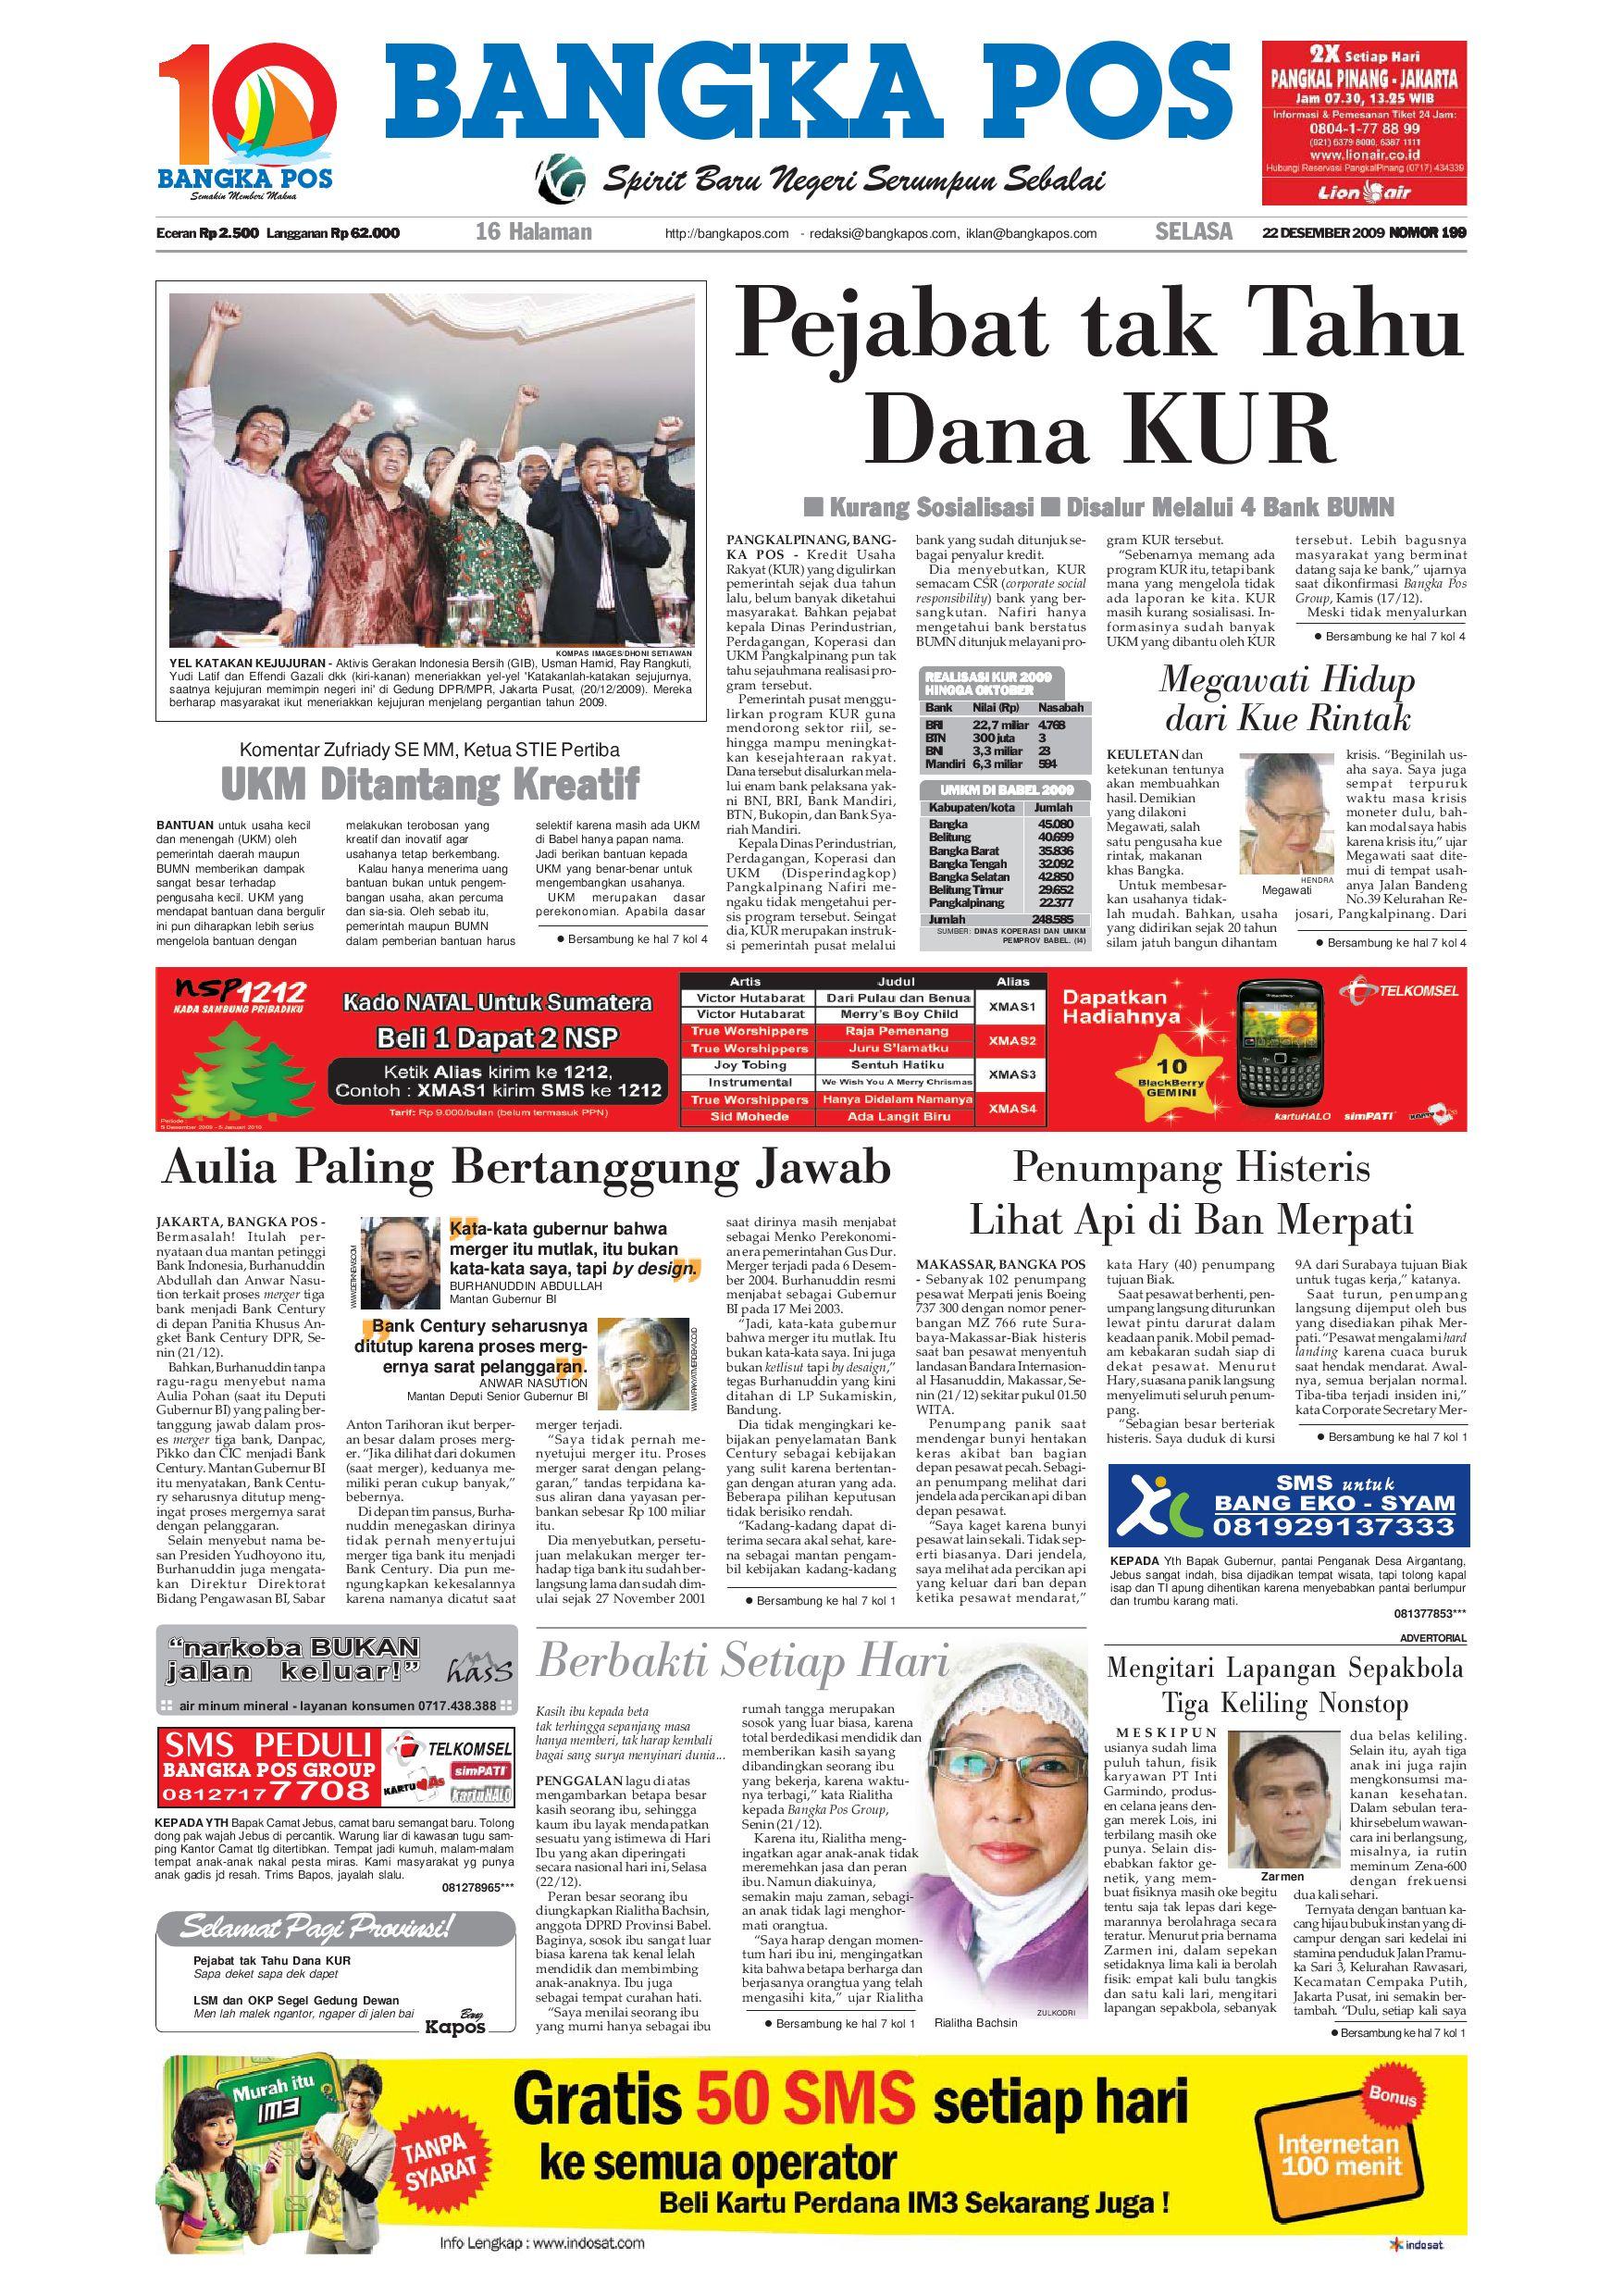 Harian Pagi Bangka Pos Edisi 22 Desember 2009 By Issuu Parcel Makanan Ampamp Keramik Pja 1608